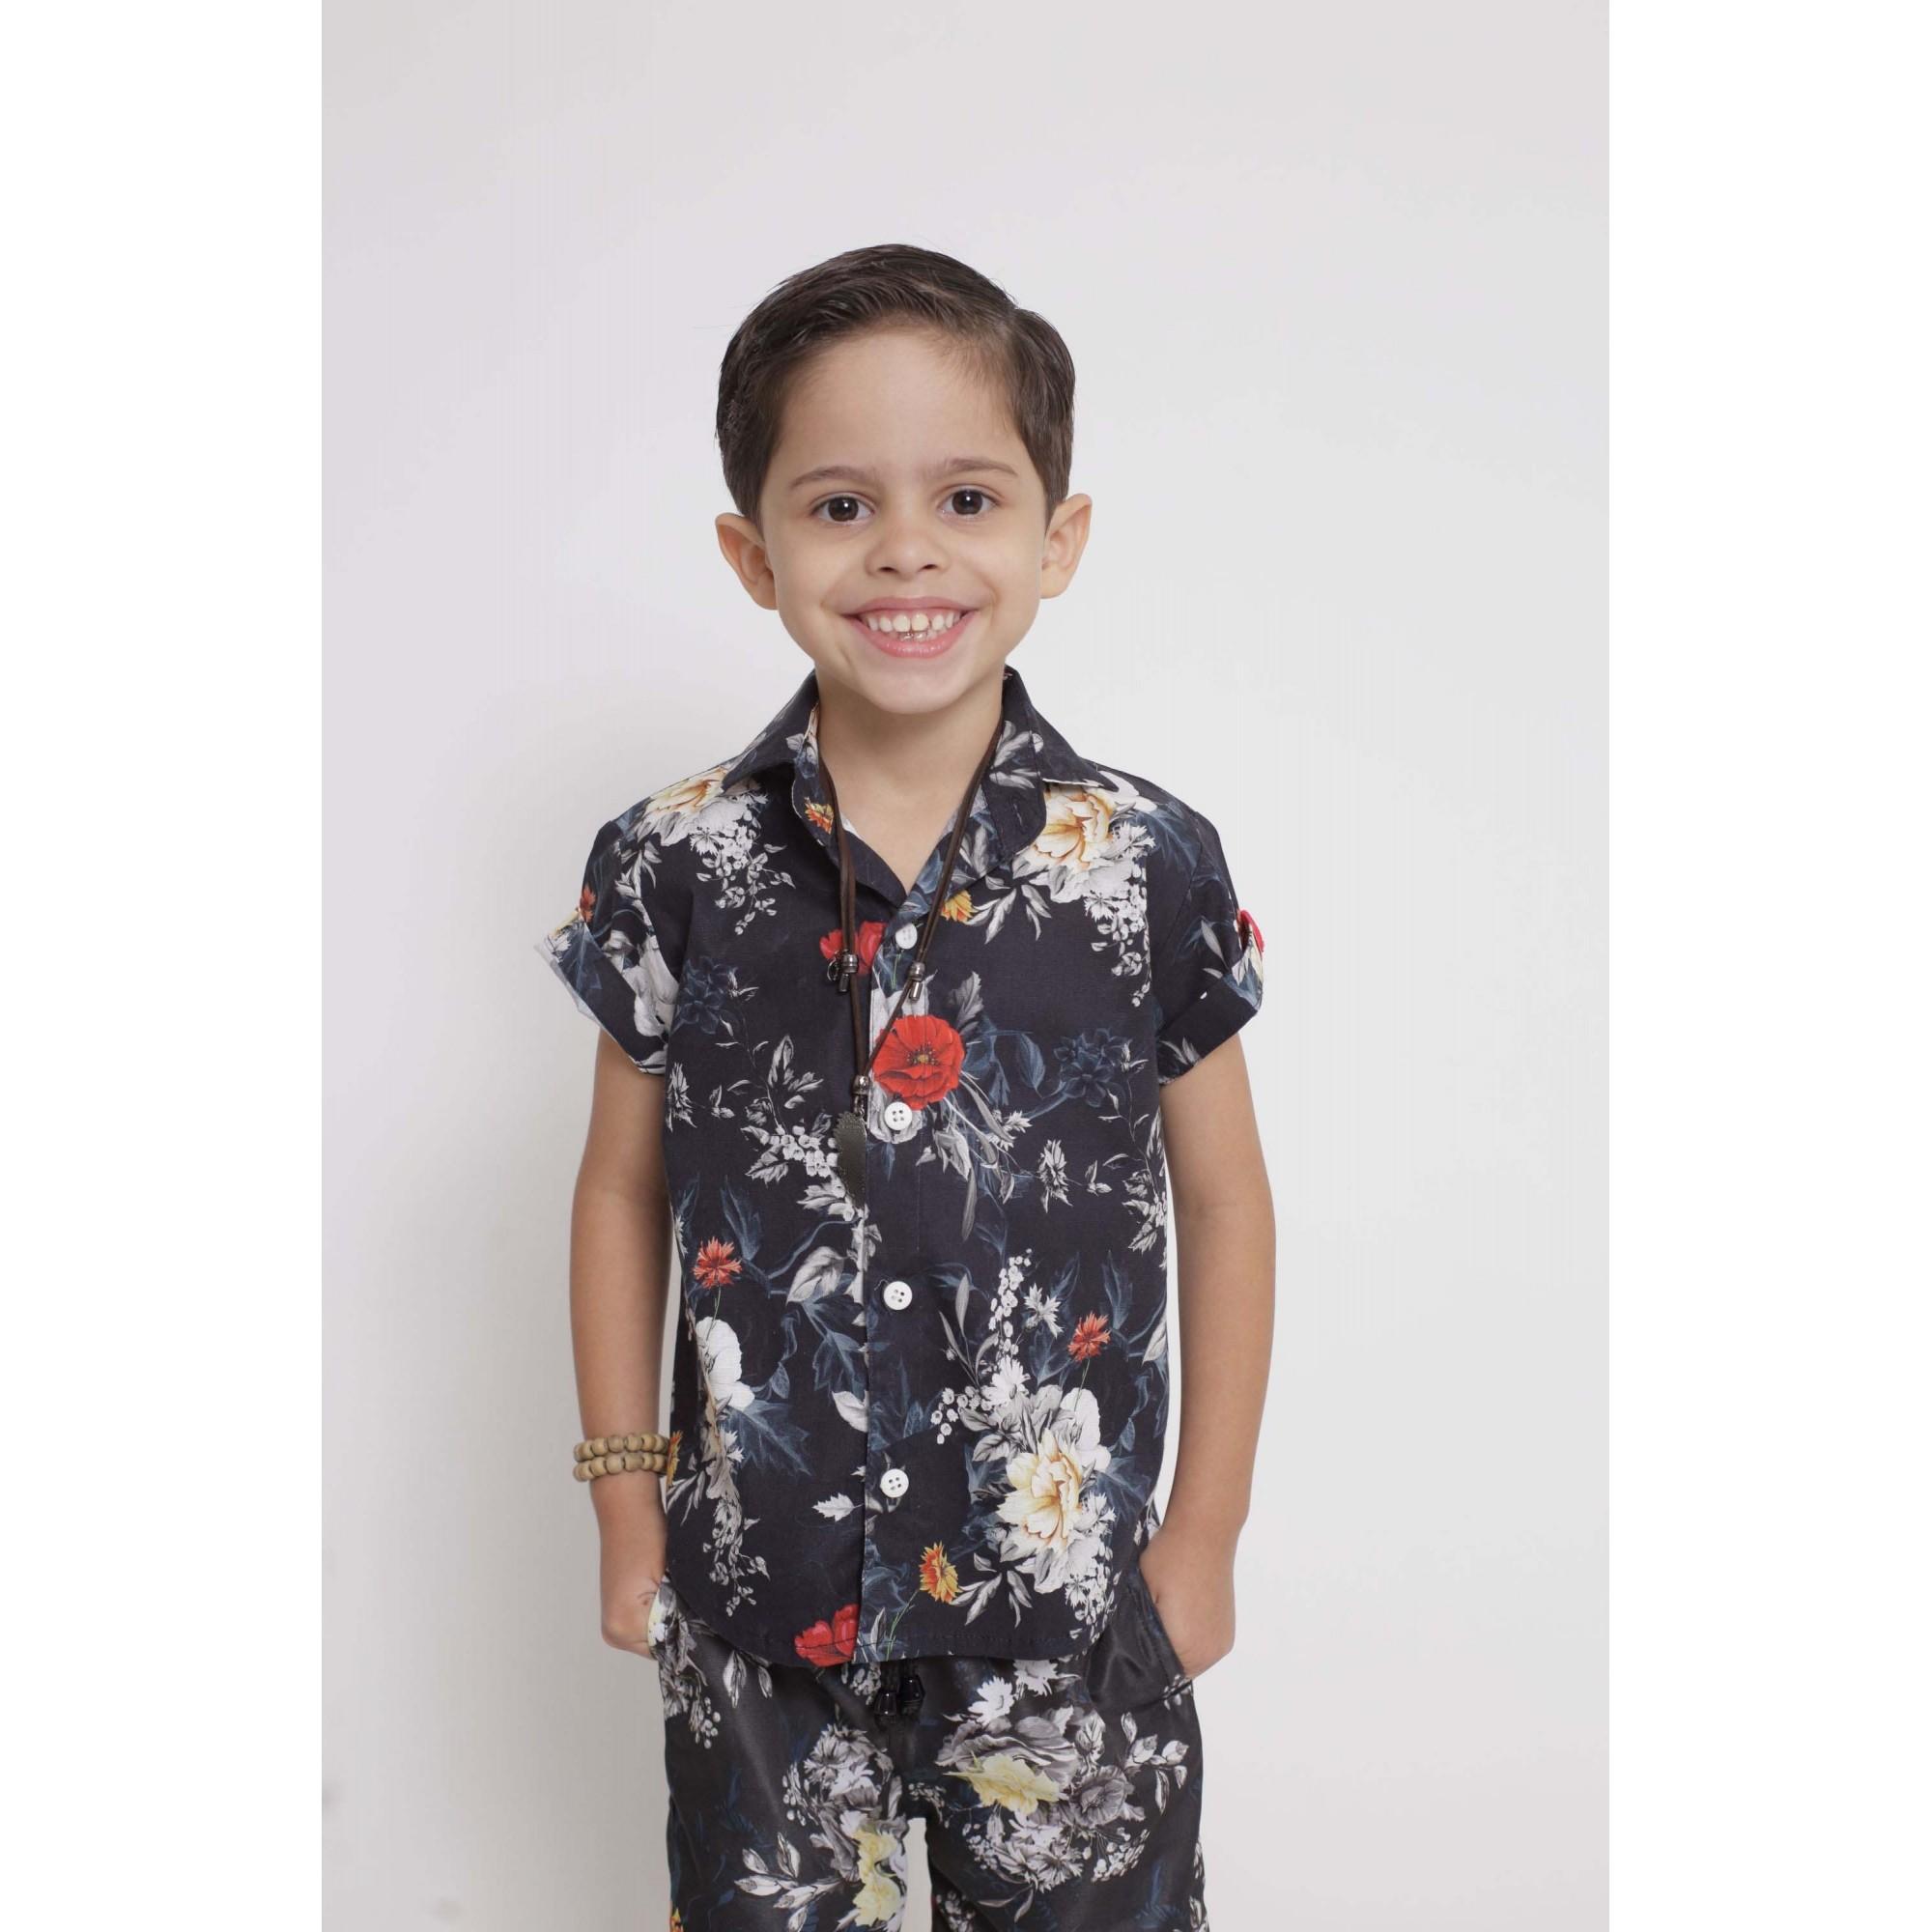 Camisa Social Manga Curta Preta Floral Infantil  - Heitor Fashion Brazil